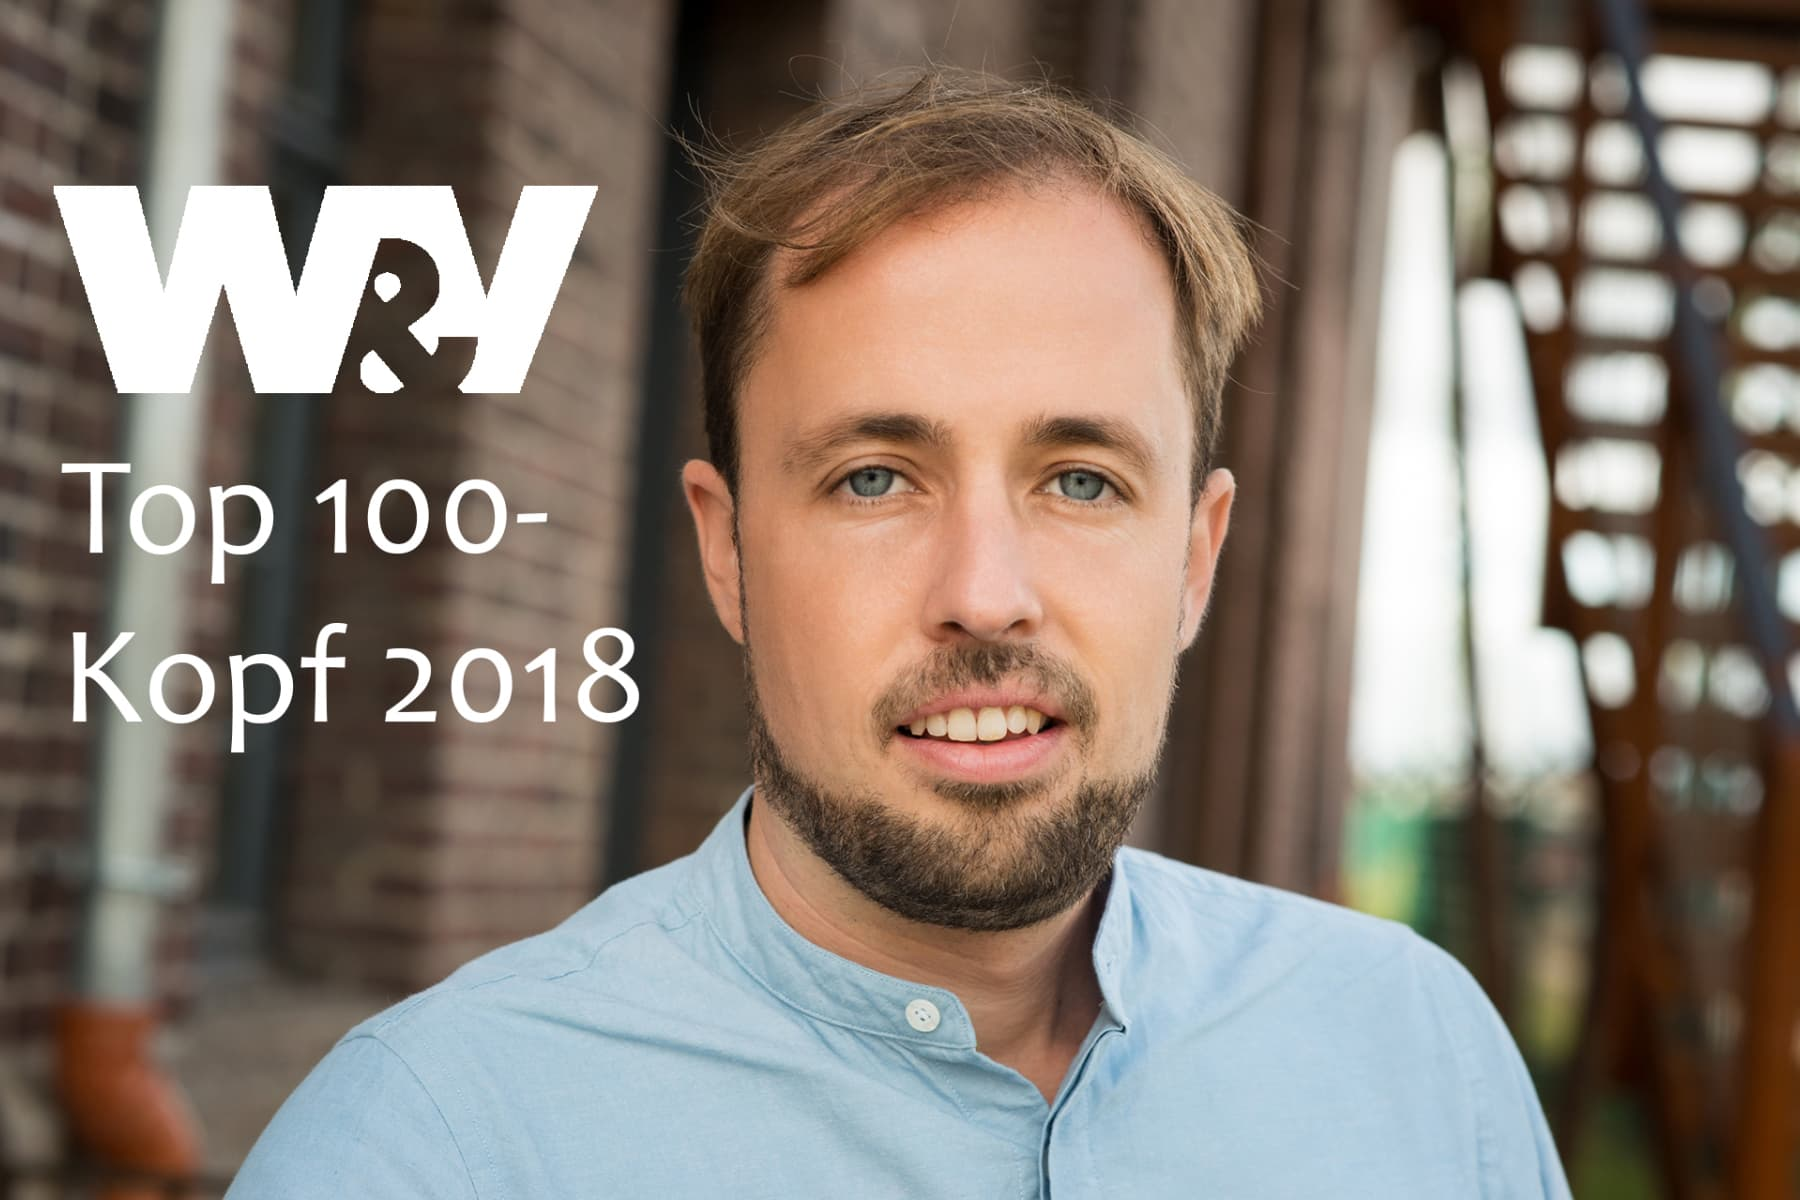 Sinus-Institut unter den w&v-Top100 2018